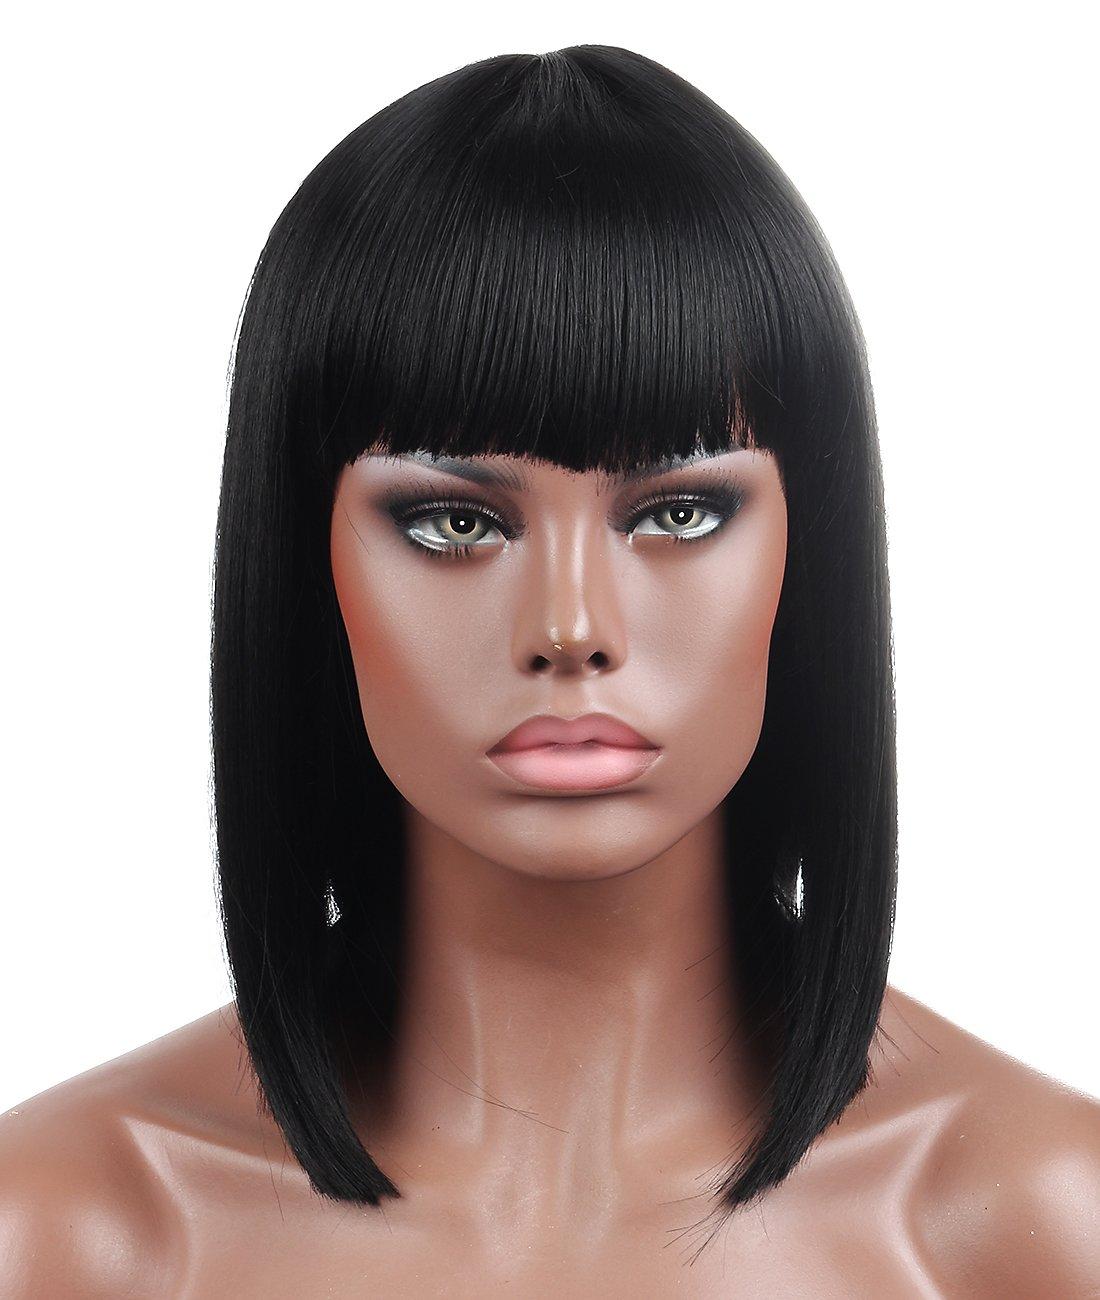 Kalyss Bob Short Hair Wig for Black Women Heat Resistant Yaki Synthetic  Hair Women s Wig With 81e1005ec4